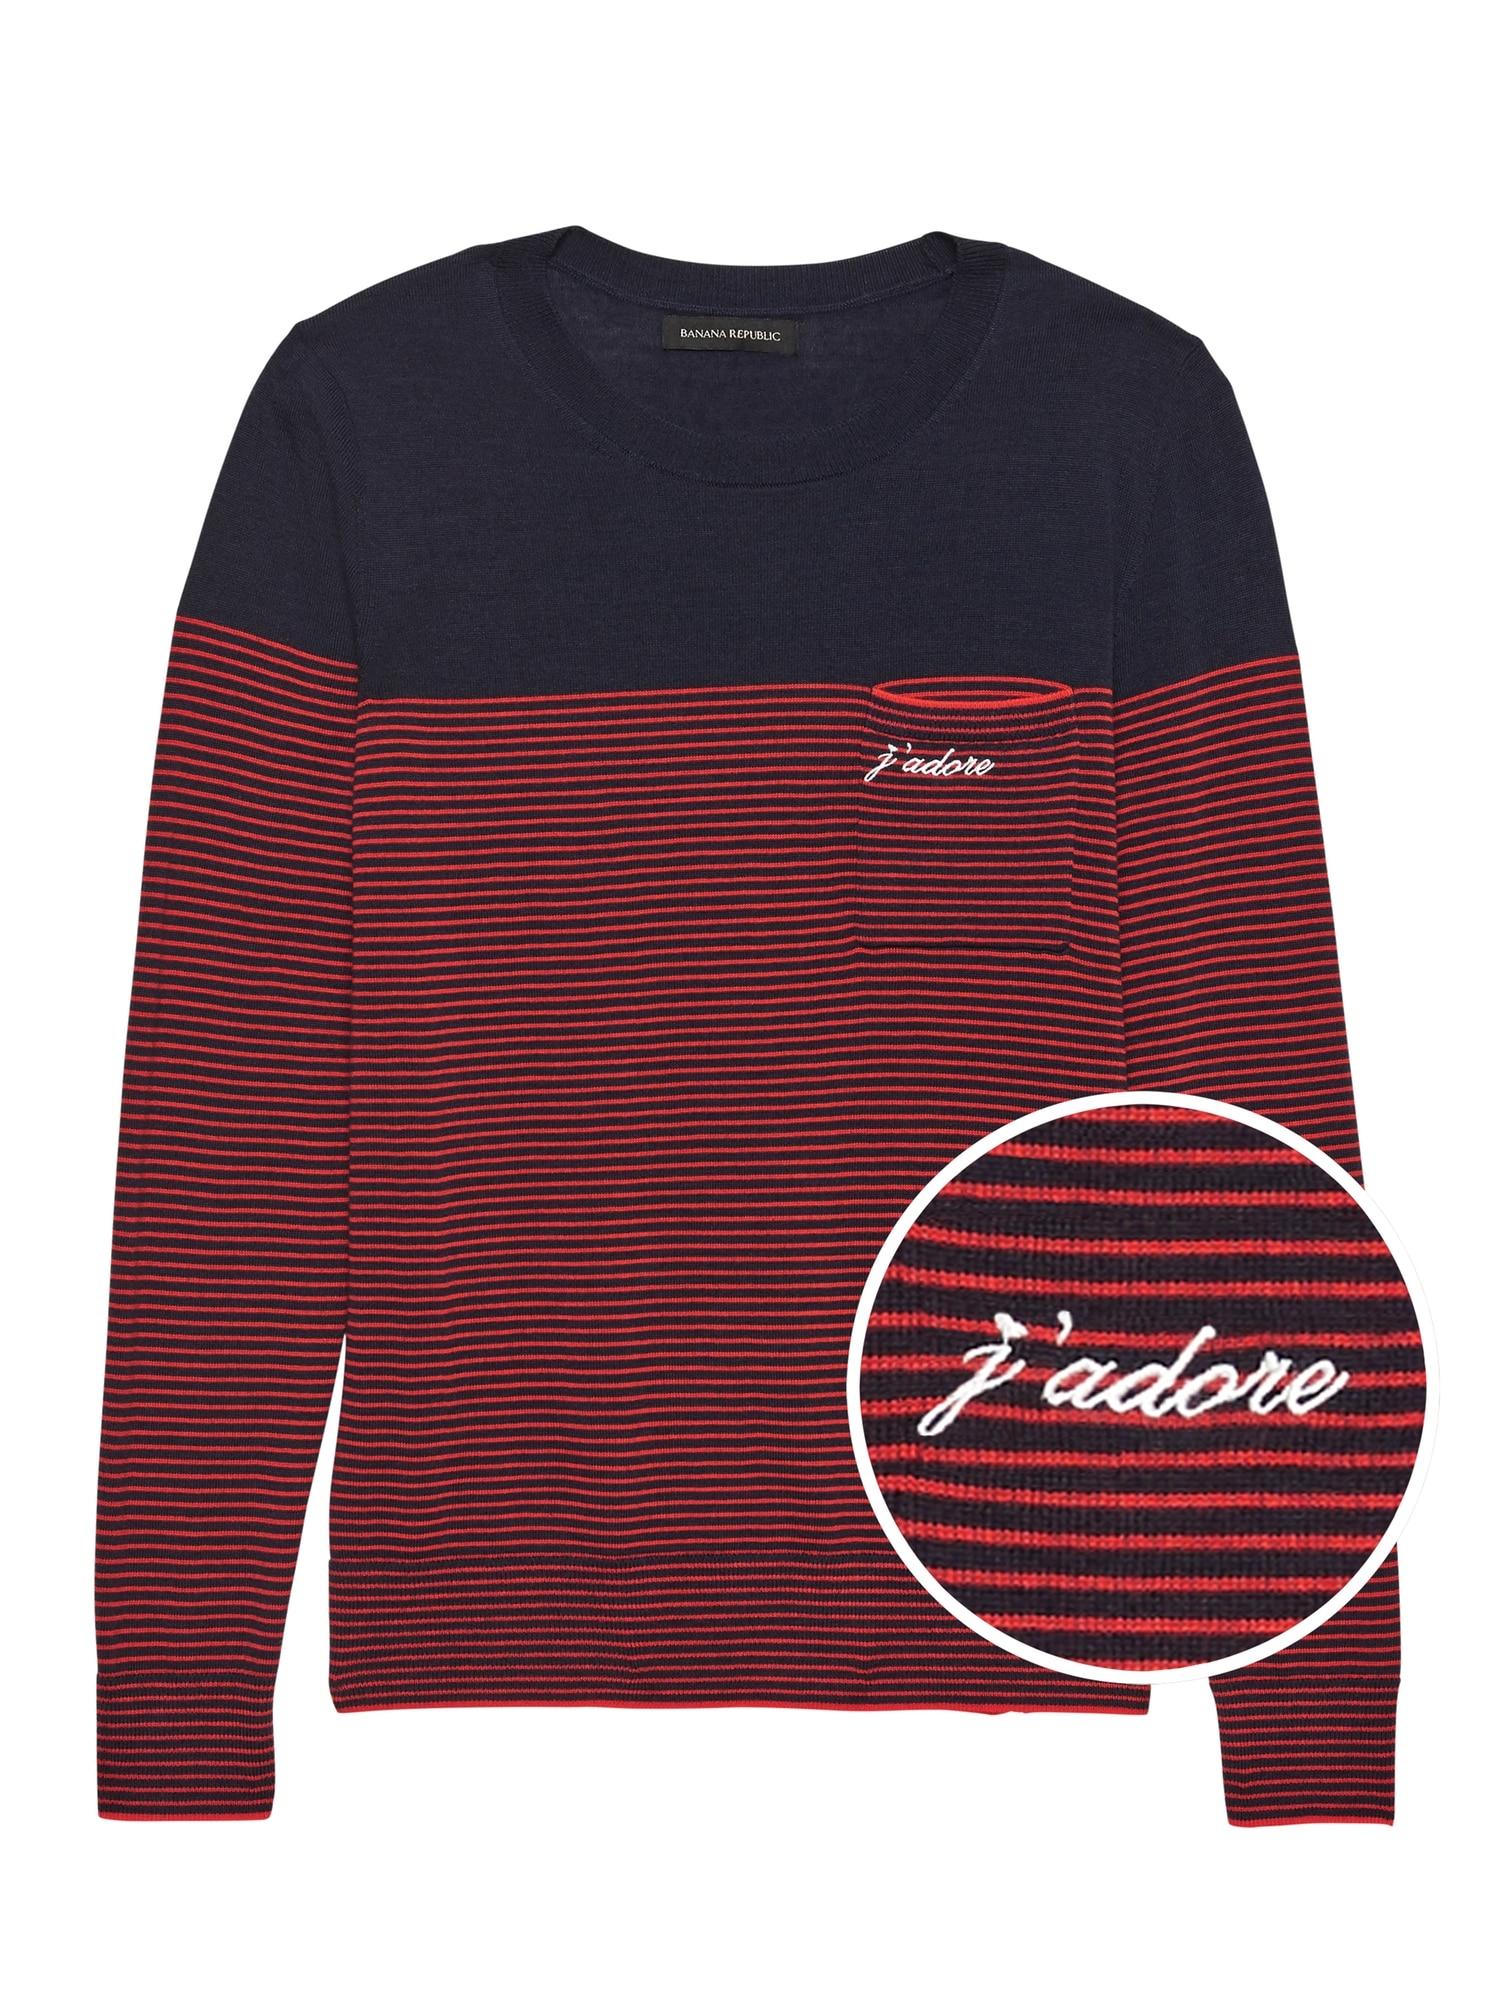 fd8bfce99 J adore Stripe Pocket Sweater